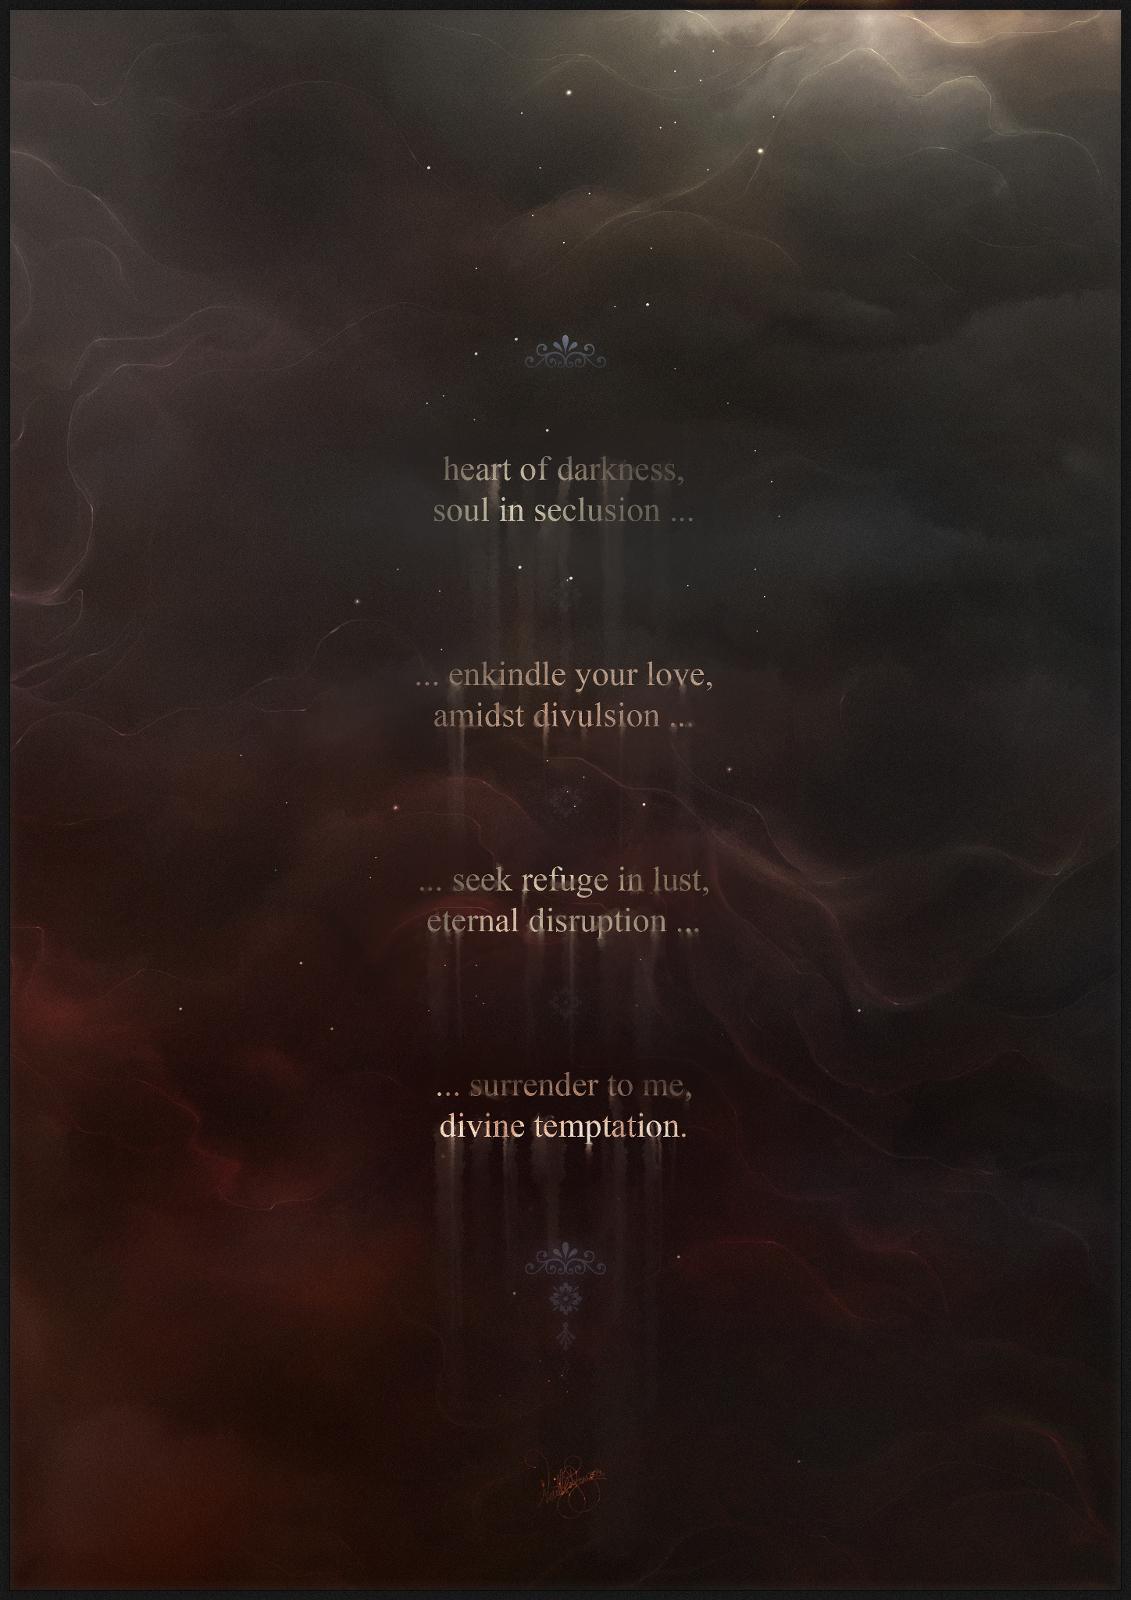 poem for divine temptation by nevs28